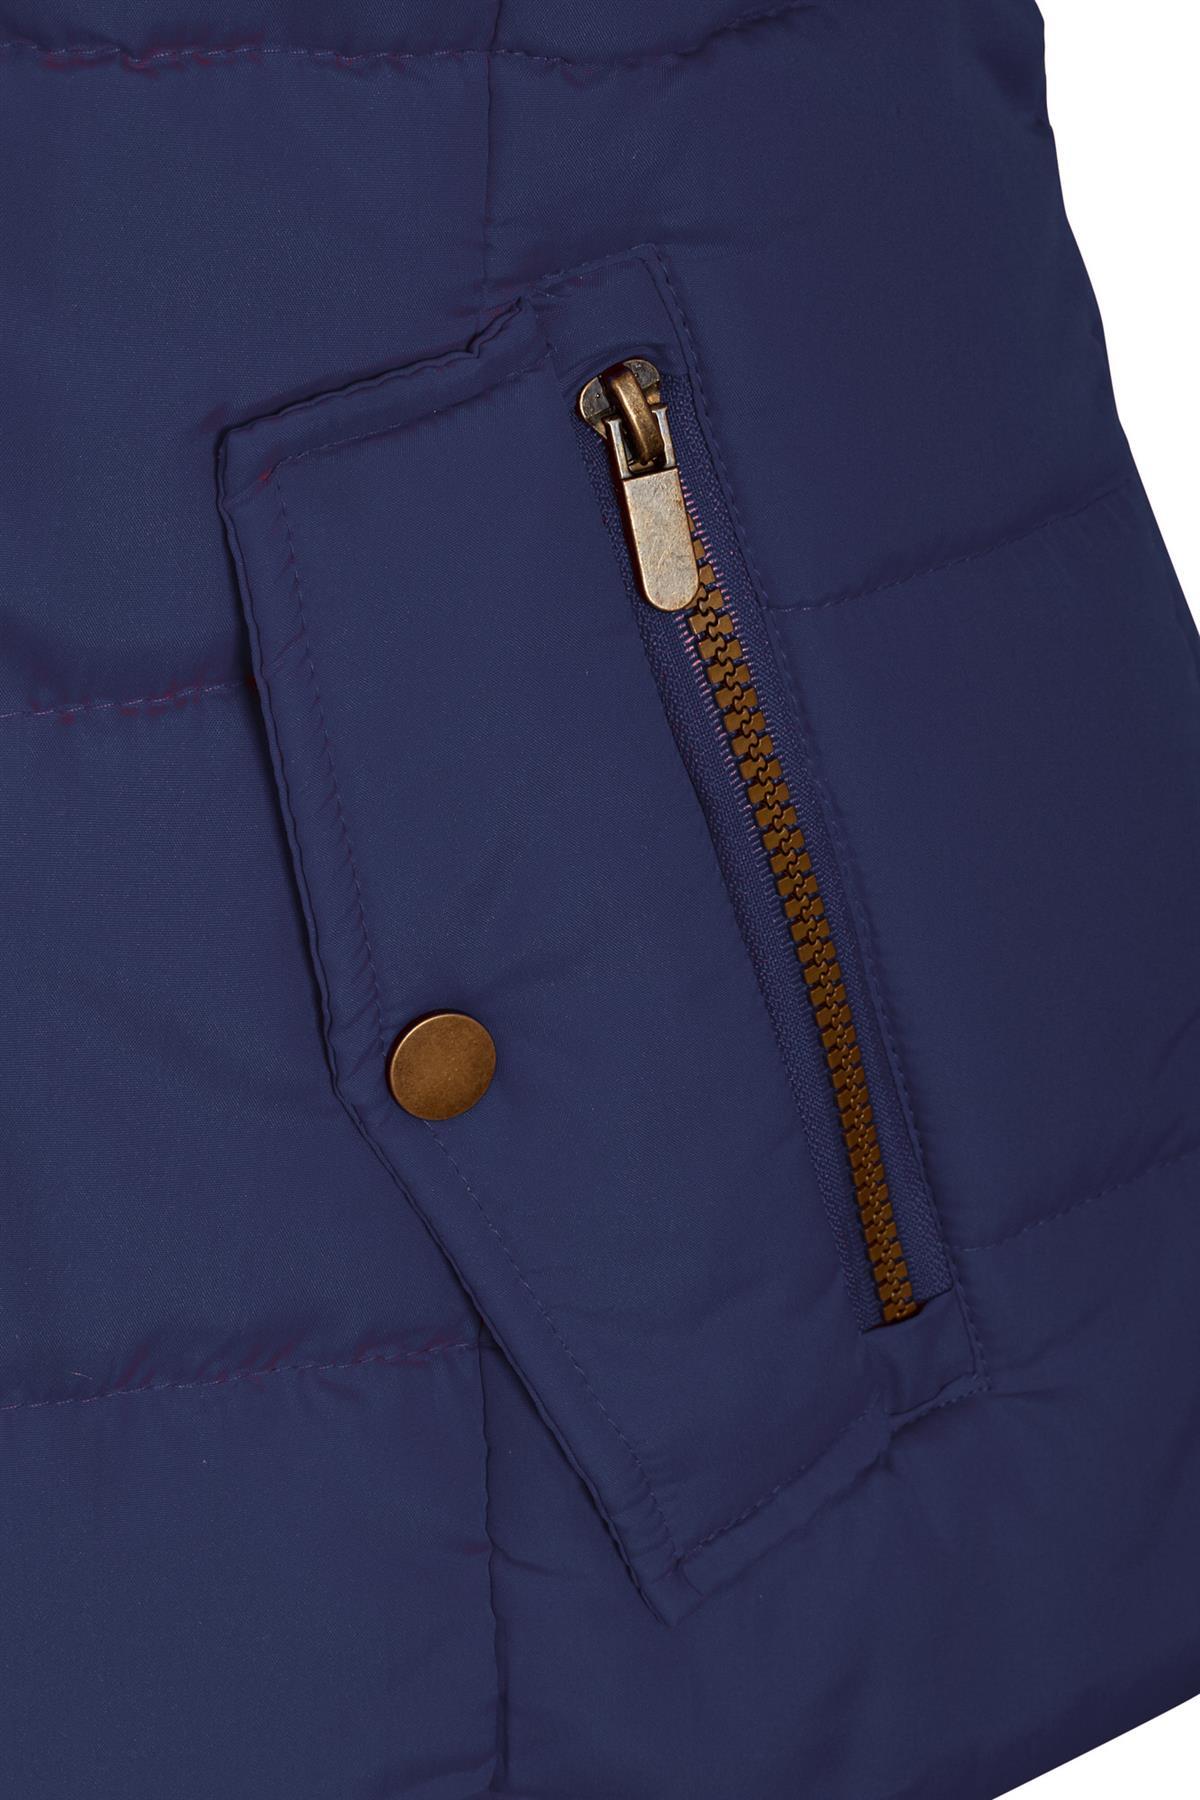 Shelikes-Ladies-Padded-Faux-Fur-Trim-Hood-Hooded-Jacket-Winter-Coat-Size-6-to-16 miniatuur 6